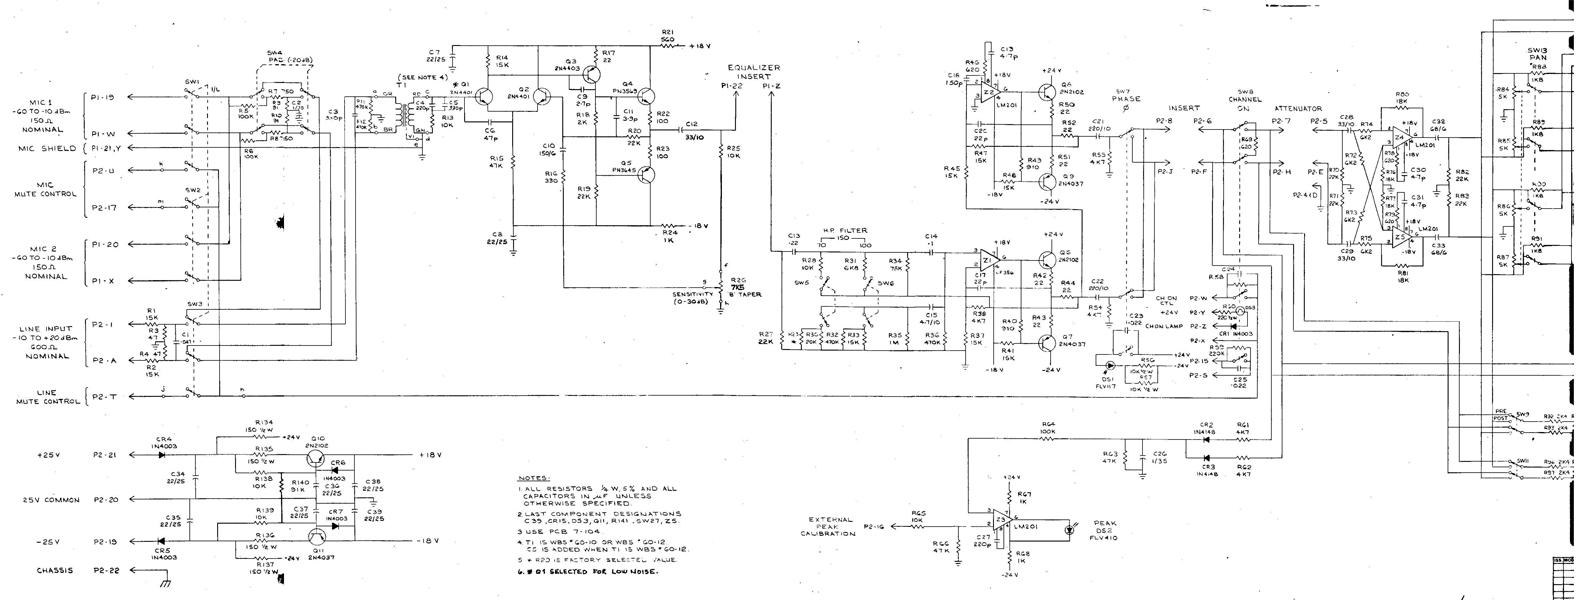 Cb Radio Wiring Diagram Gl1500 2006 Jeep Liberty Wiring Diagram